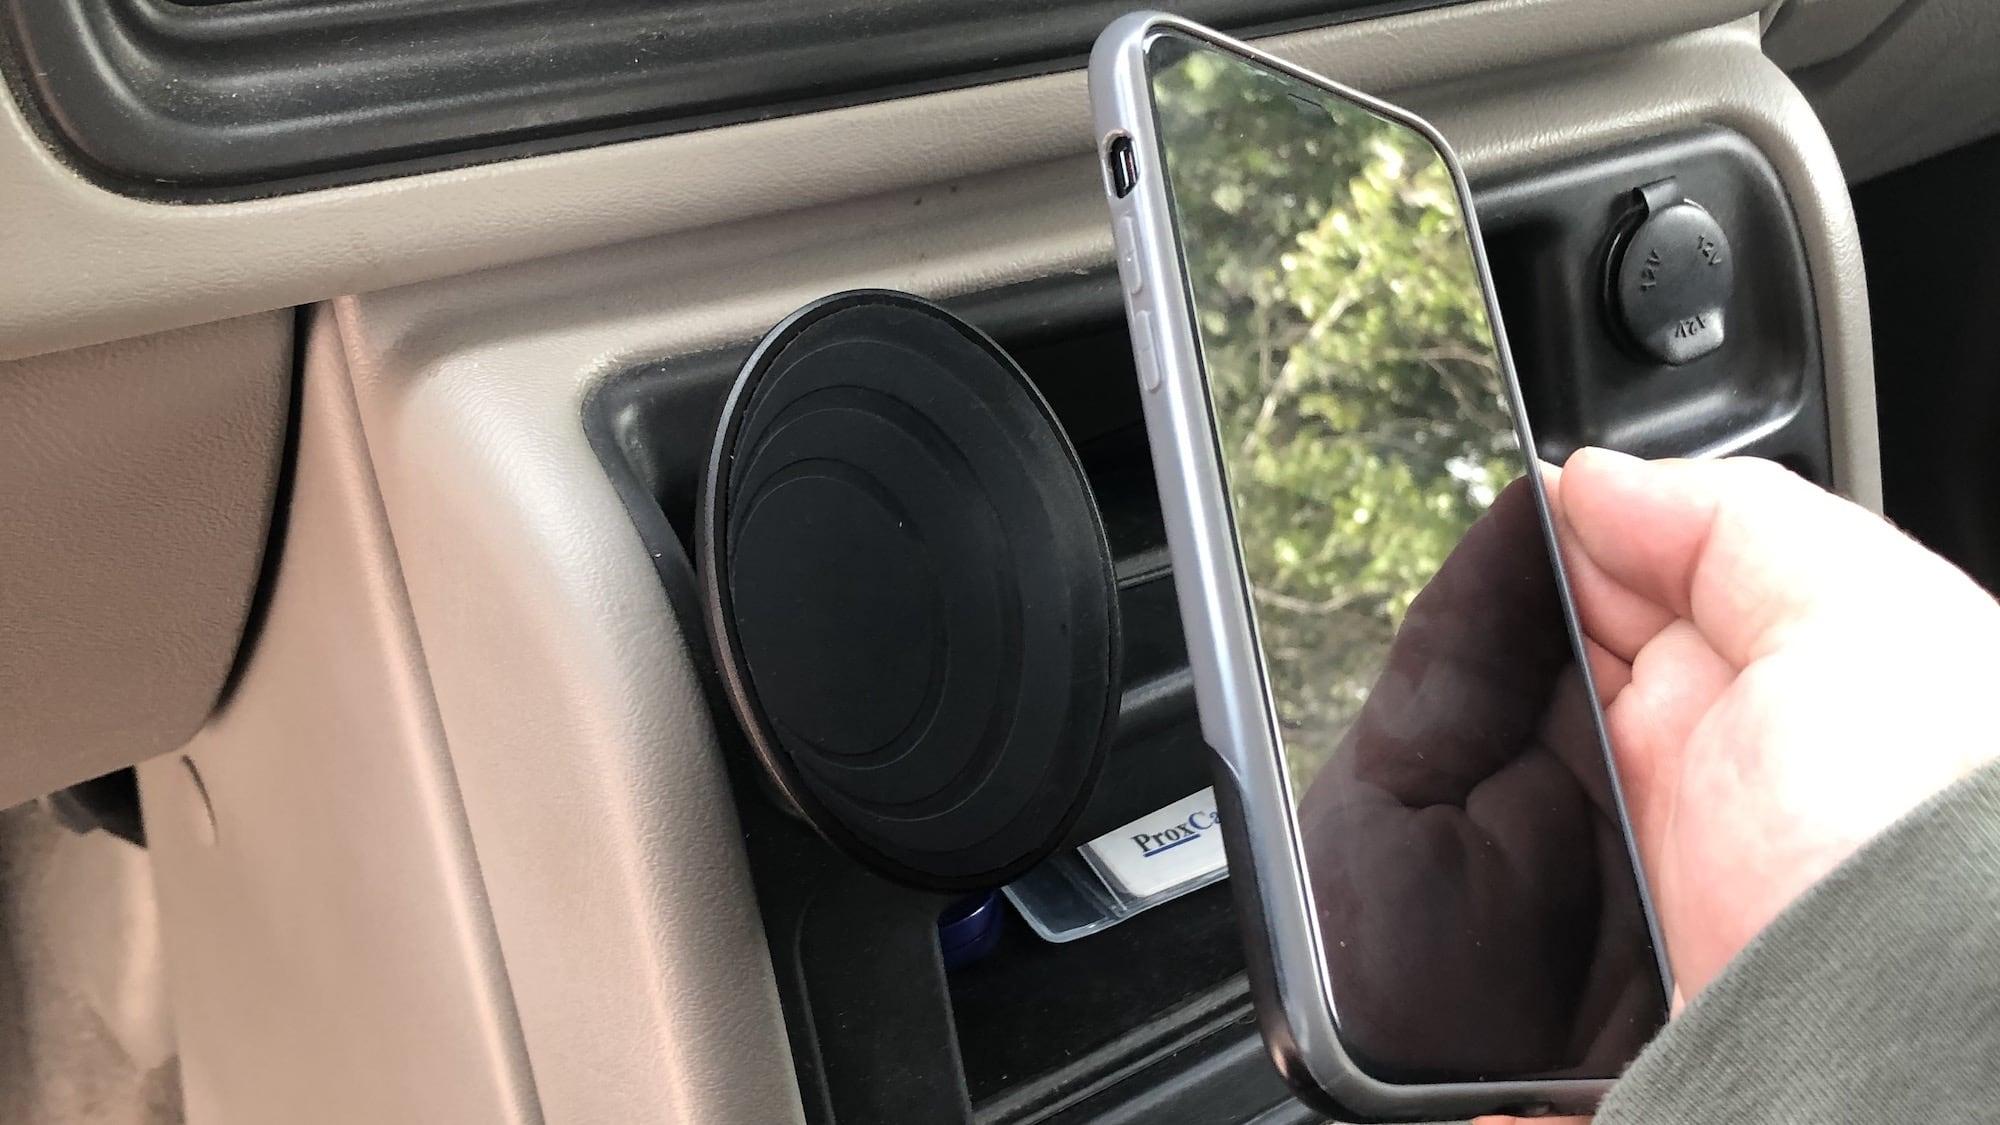 Halo Protective Smartphone Cover & Accessories